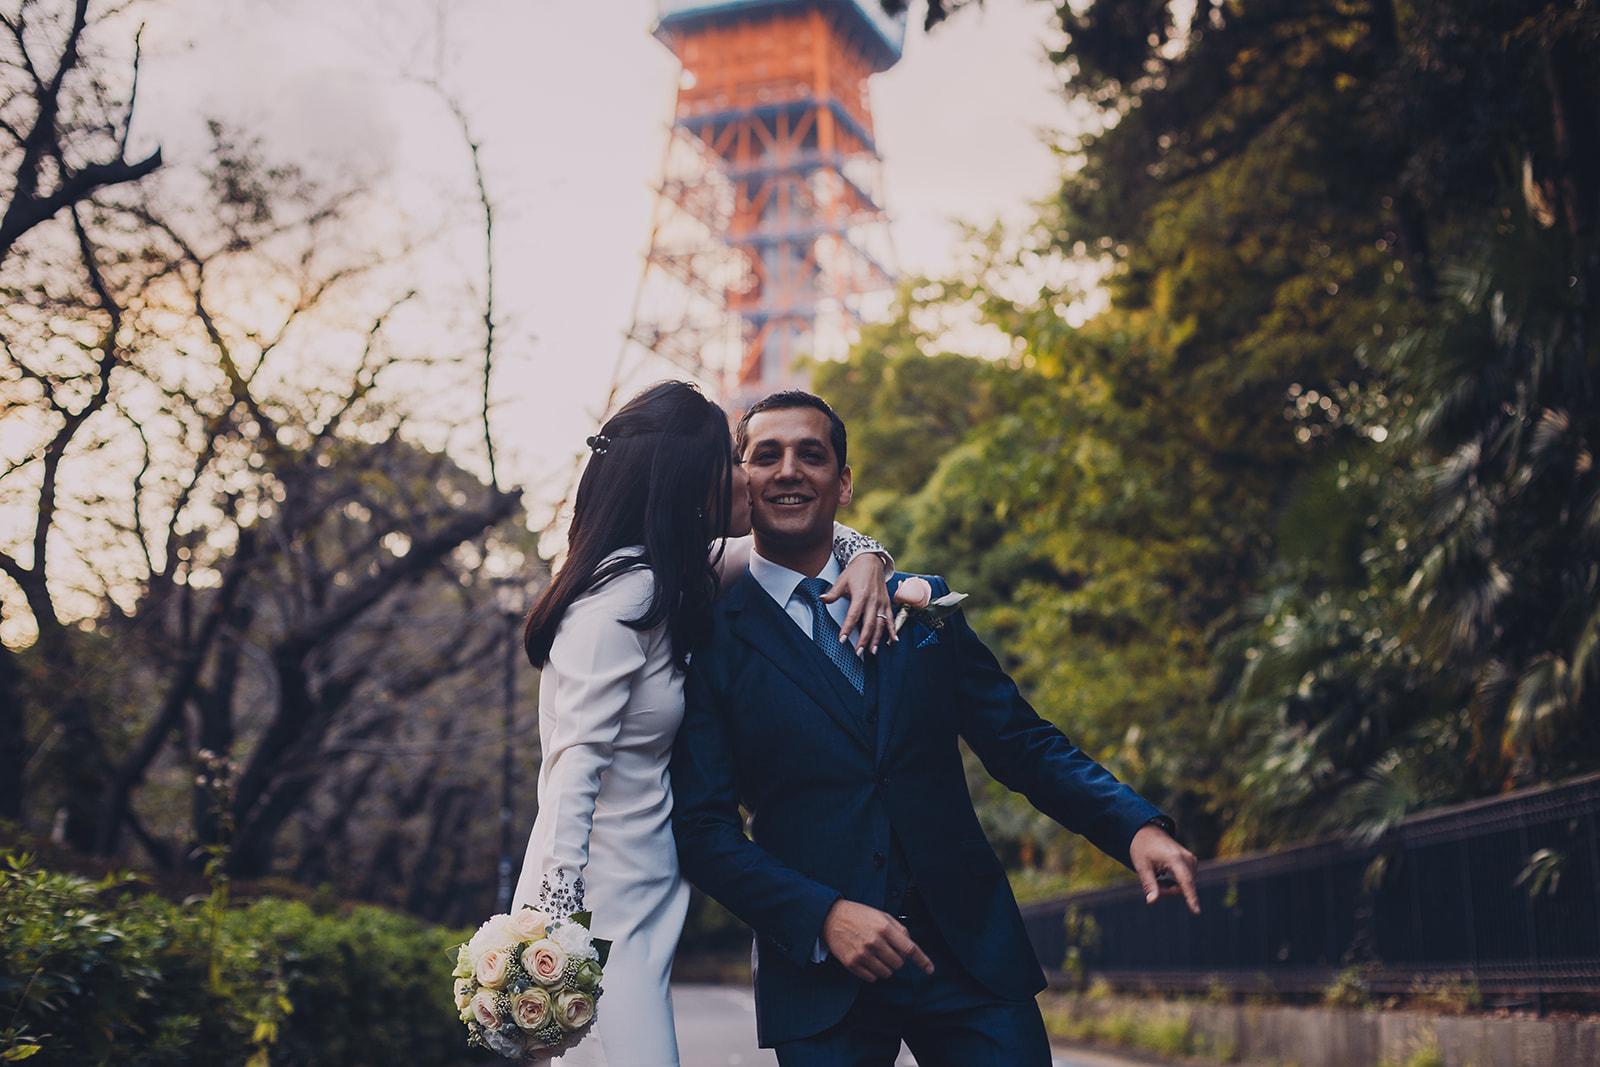 Prewedding pre wedding engagement in Tokyo Japan hire photographer (12).jpg